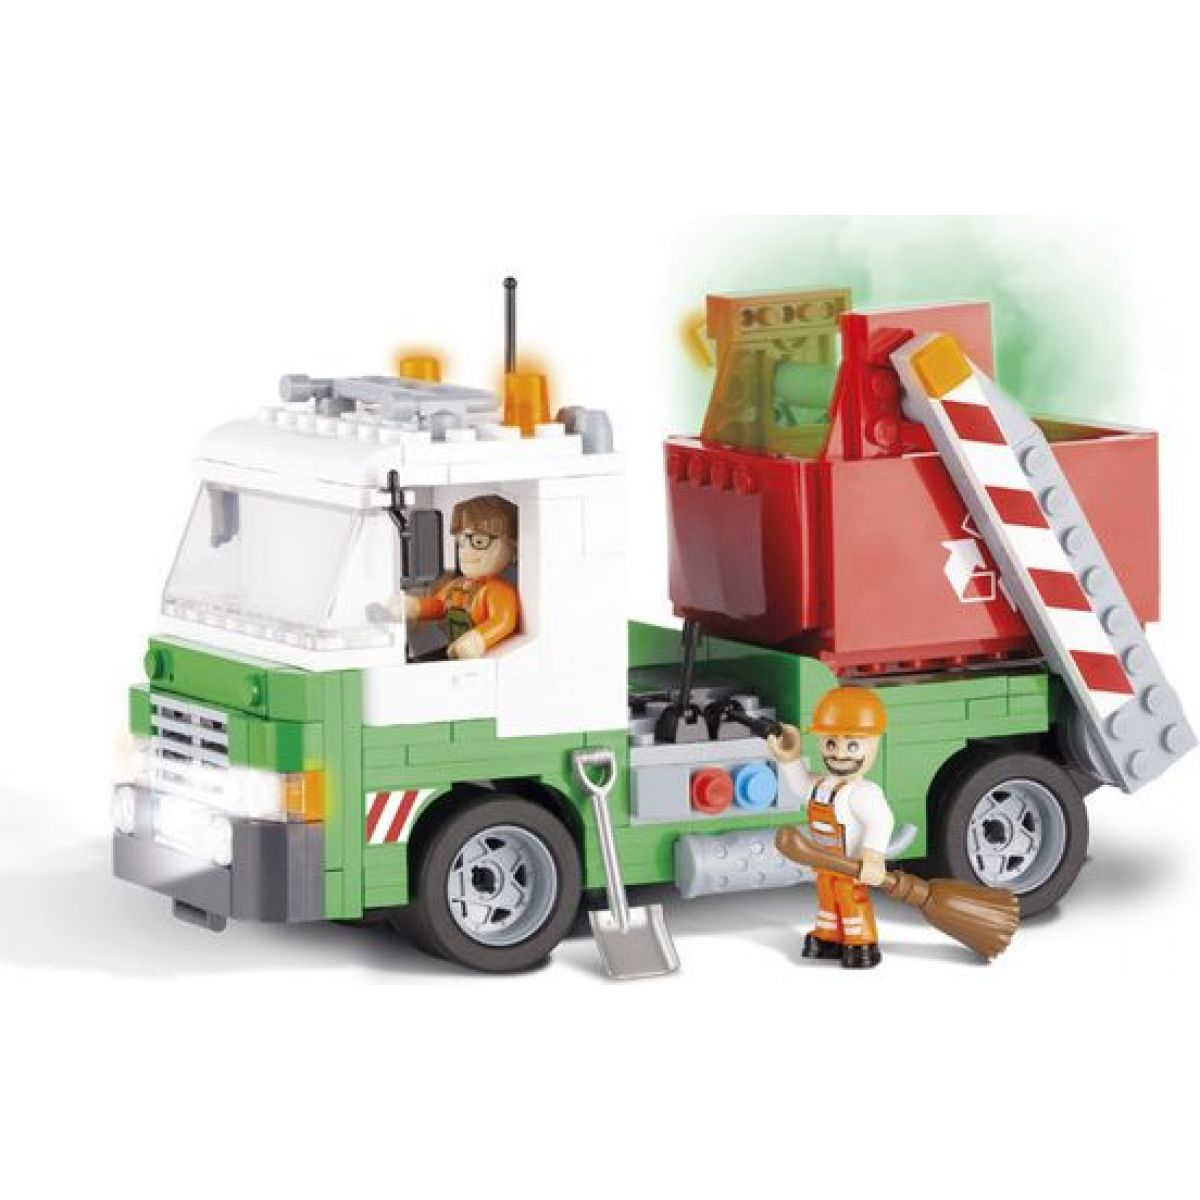 Cobi Action Town Popelářské auto s kontejnerem 260 kostek